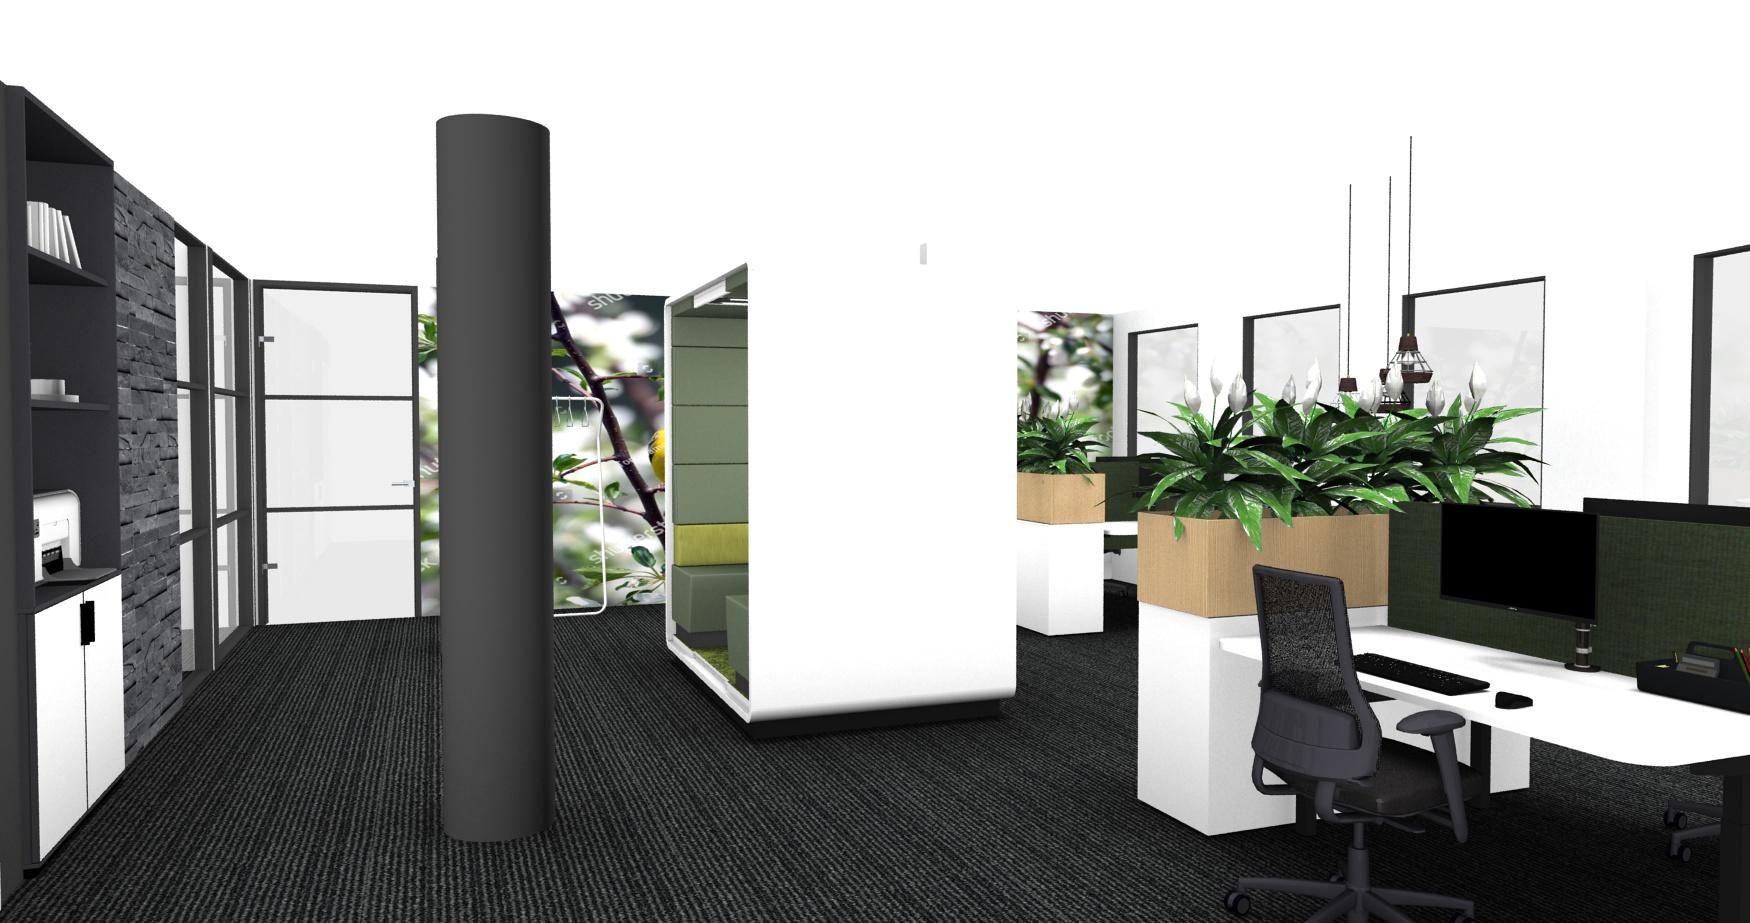 Cube_Zitstawerkplek_InsideOffice